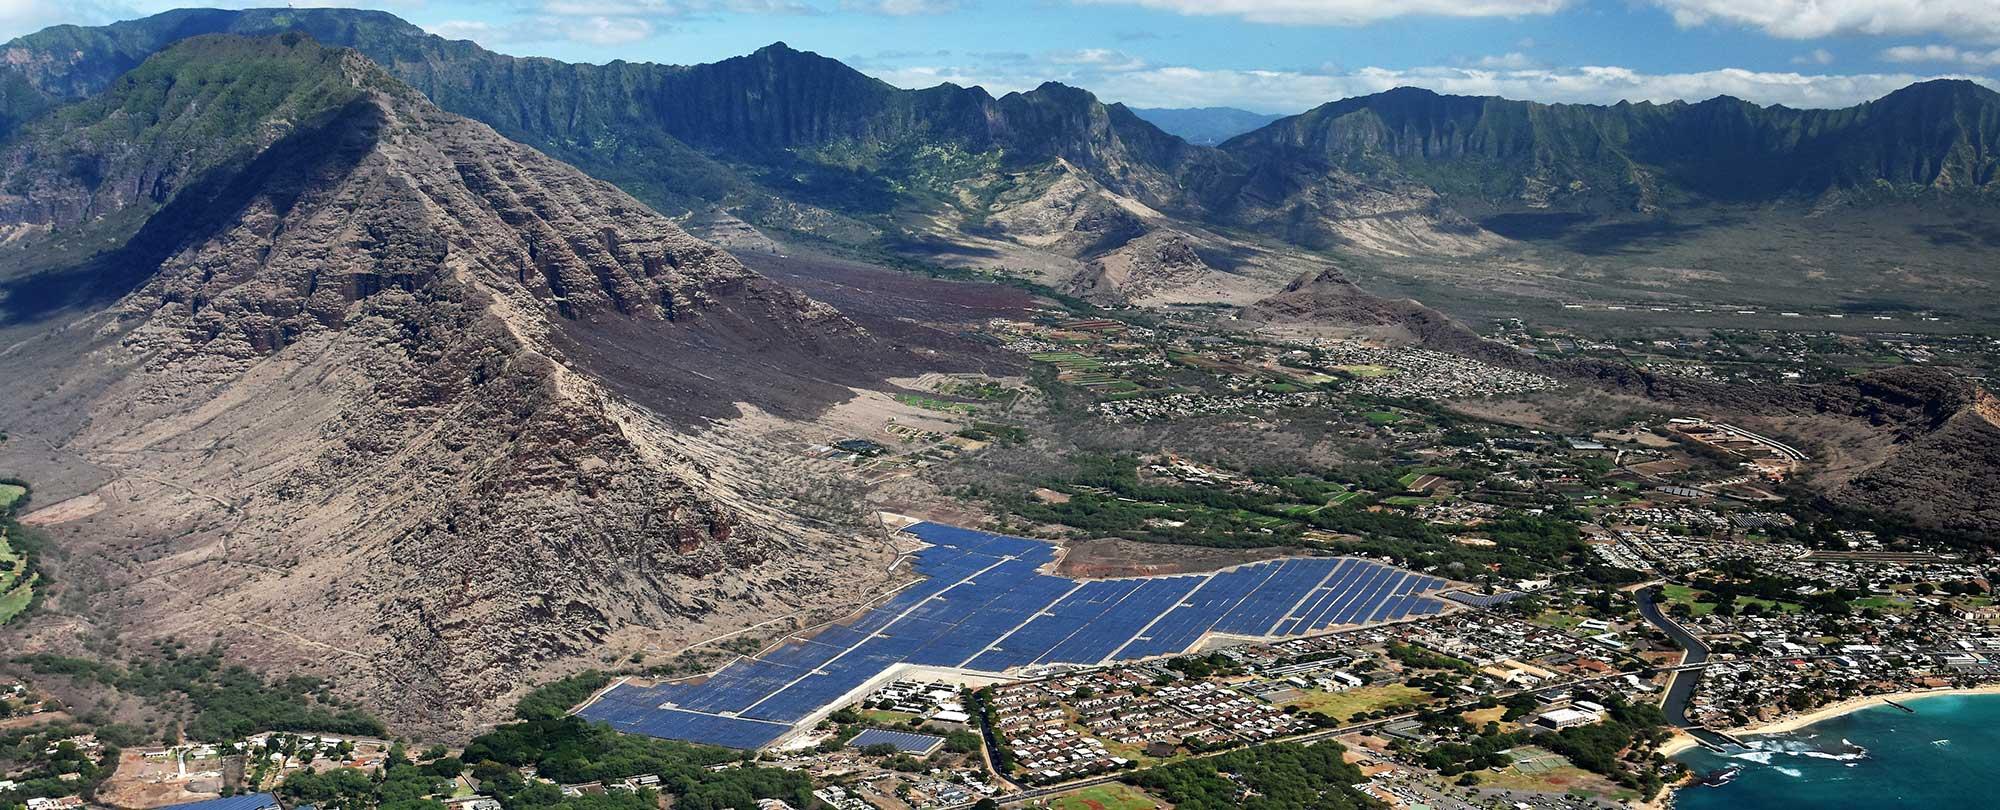 Waianae solar project